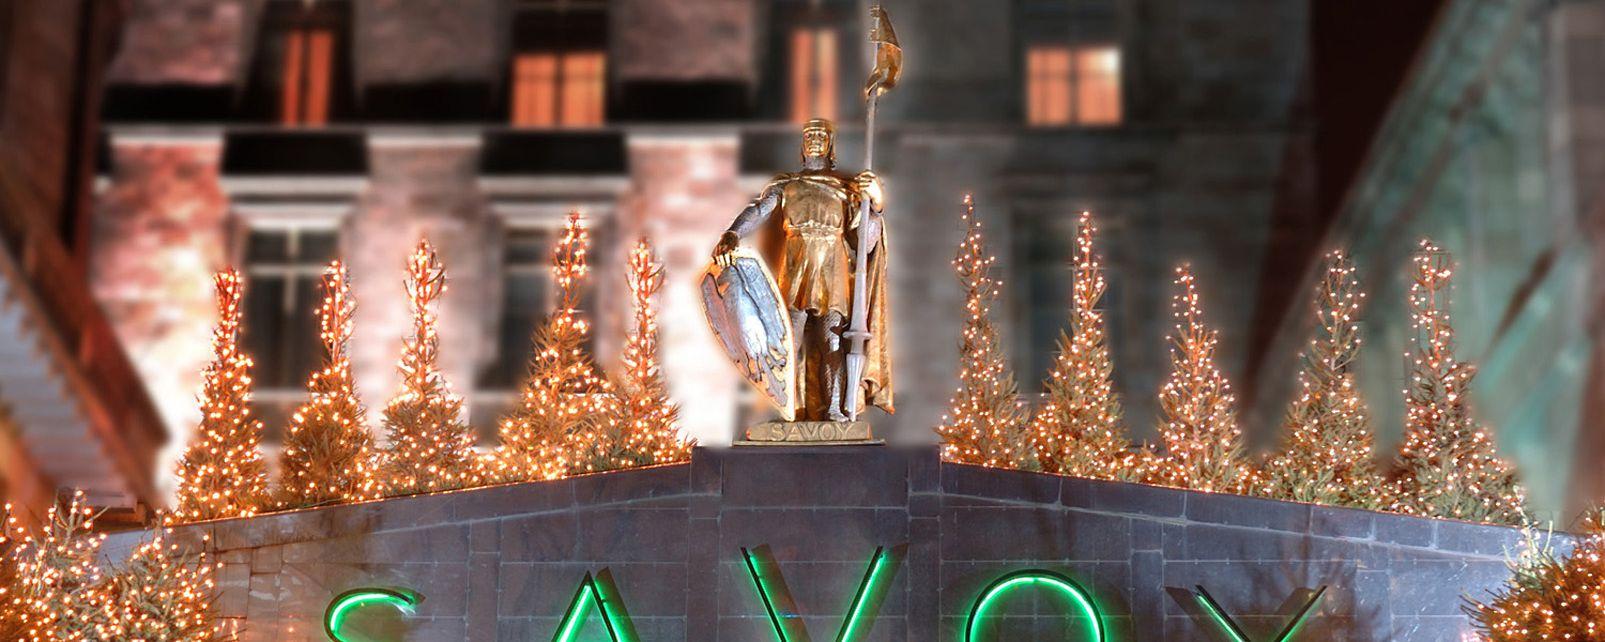 Hotel  The Savoy